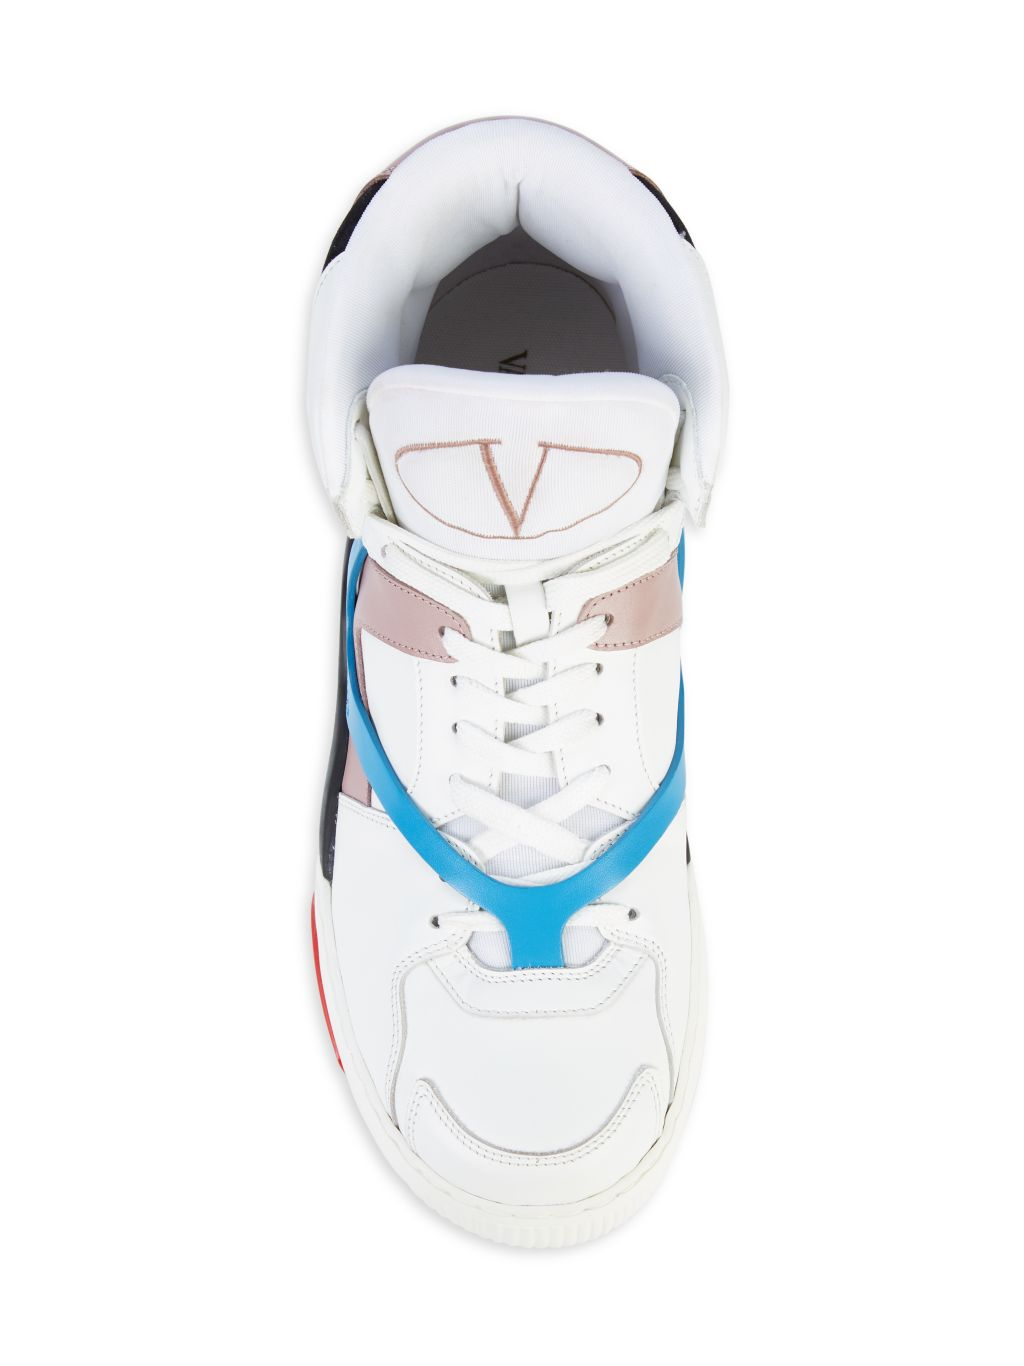 Valentino Garavani Bianco Leather High-Top Sneakers